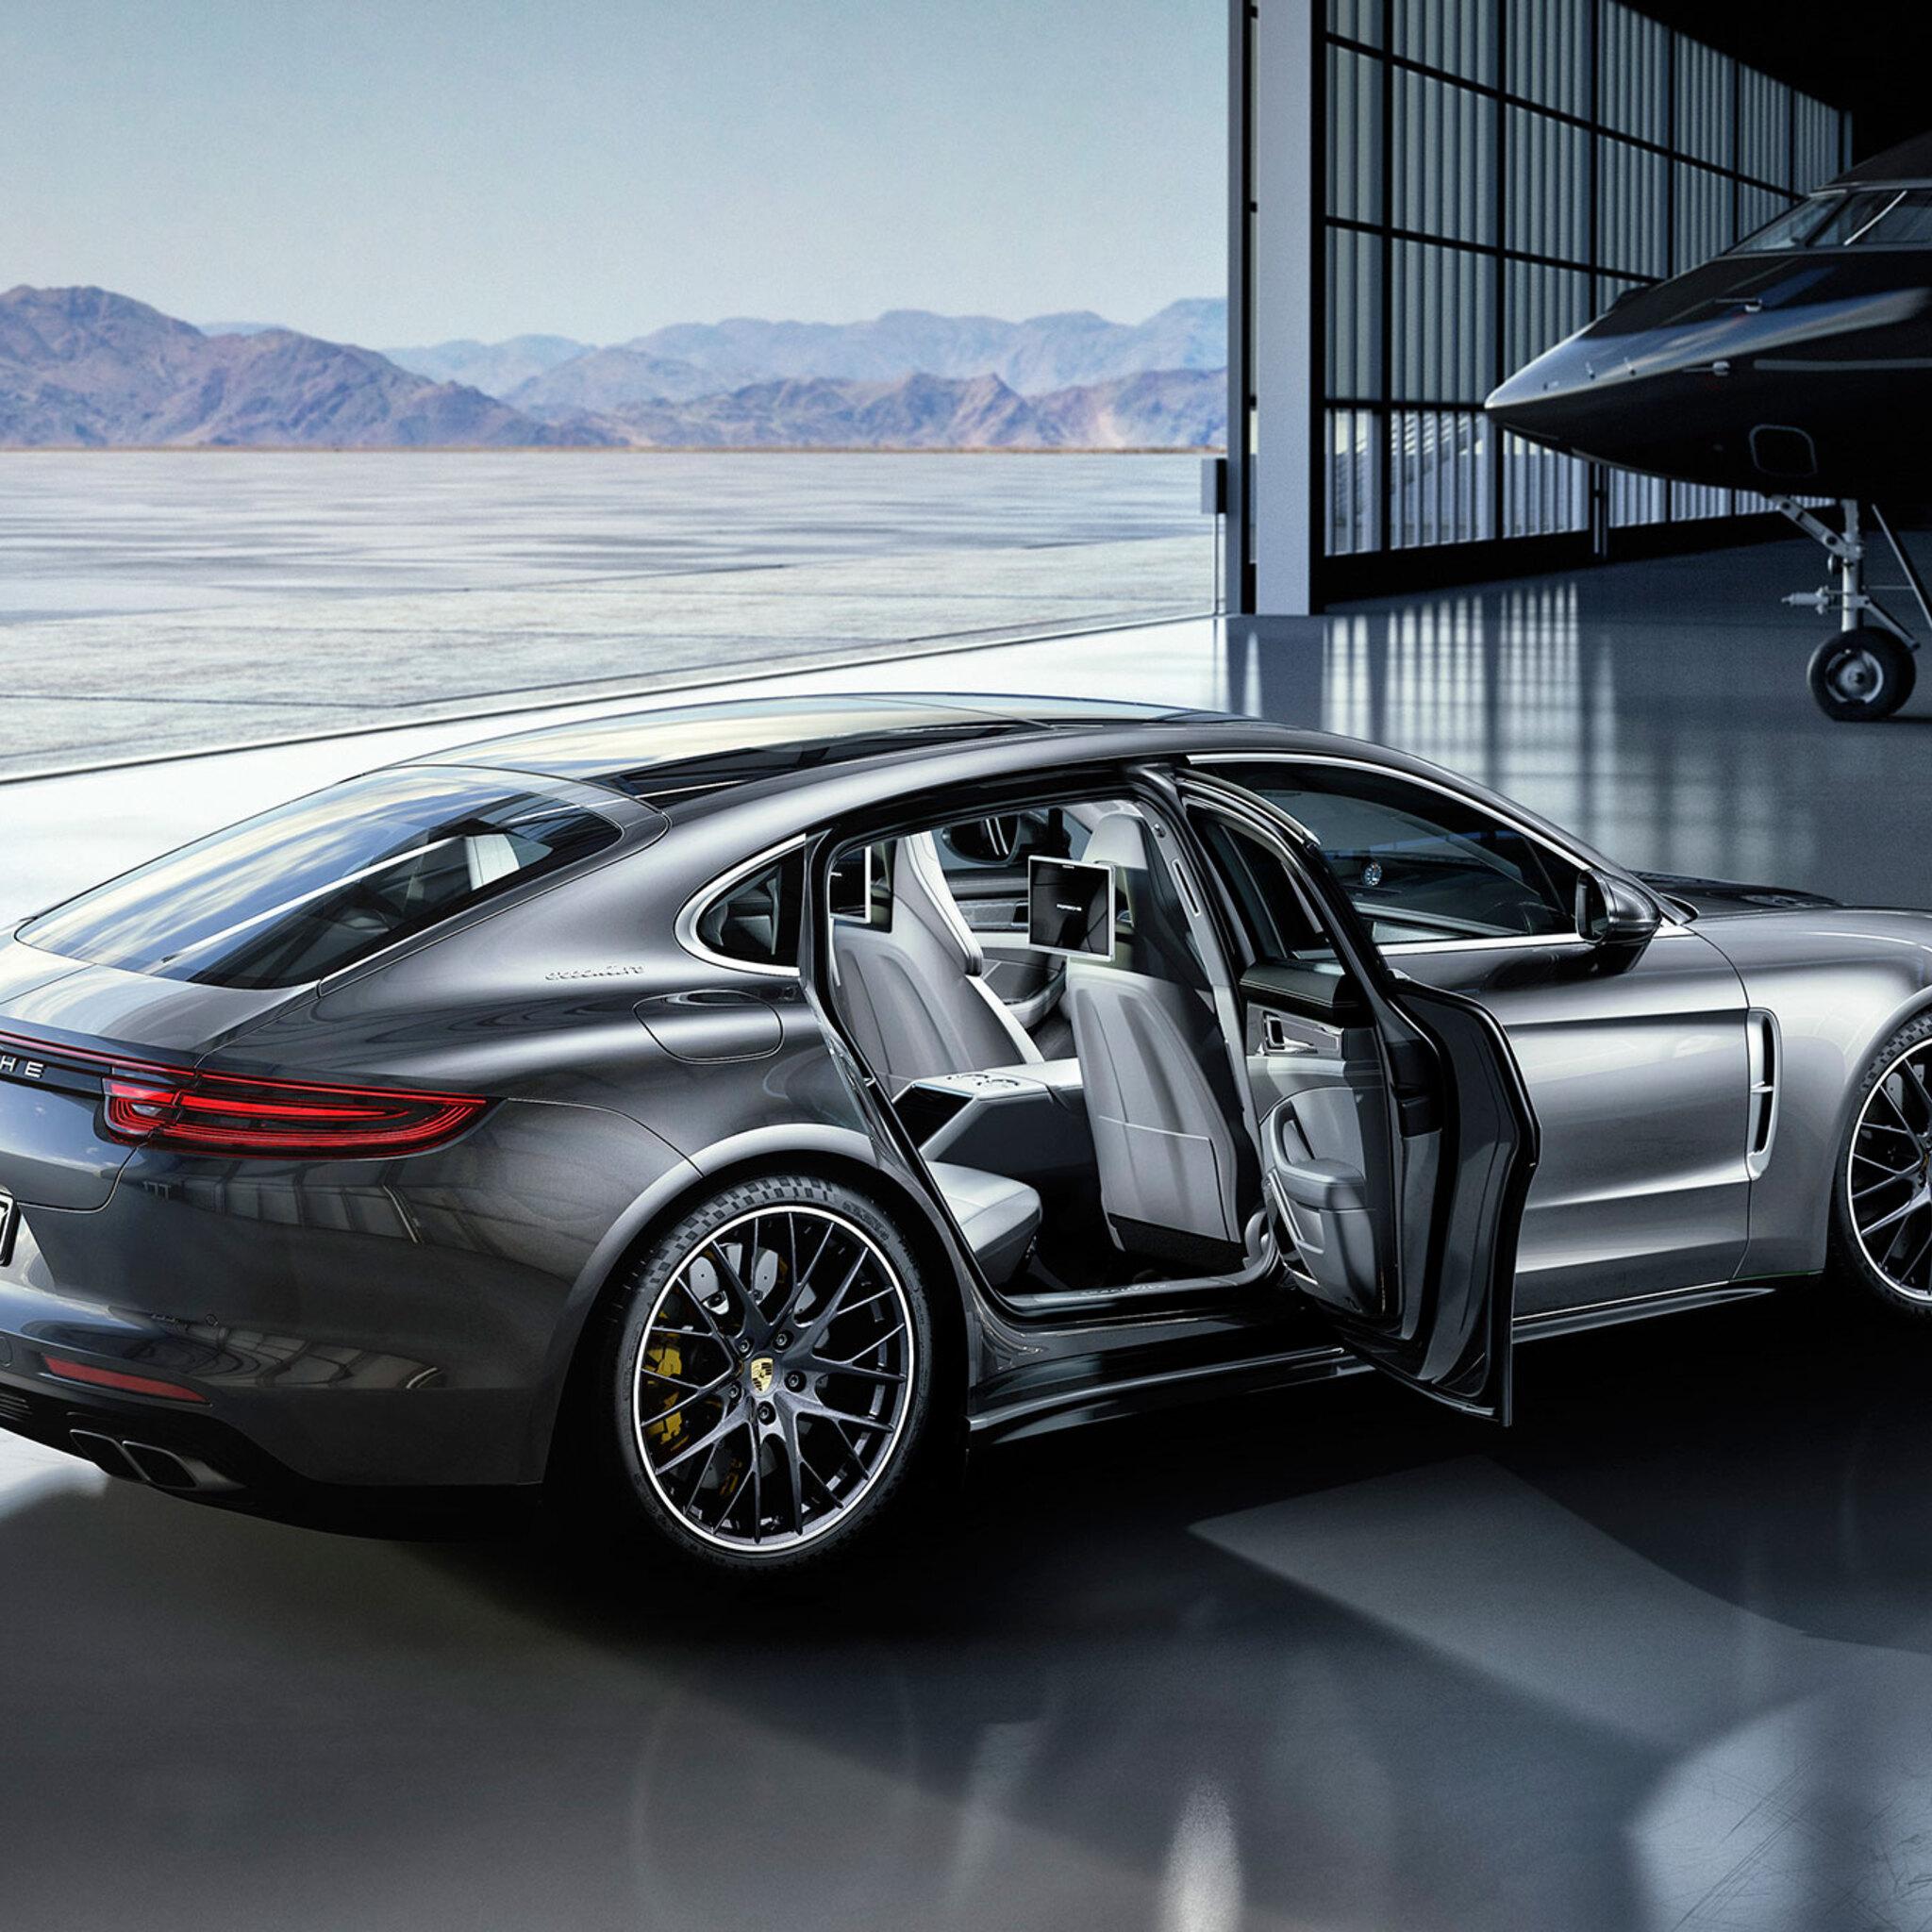 Porsche Car Wallpaper: 2048x2048 2017 Porsche Panamera Turbo Ipad Air HD 4k